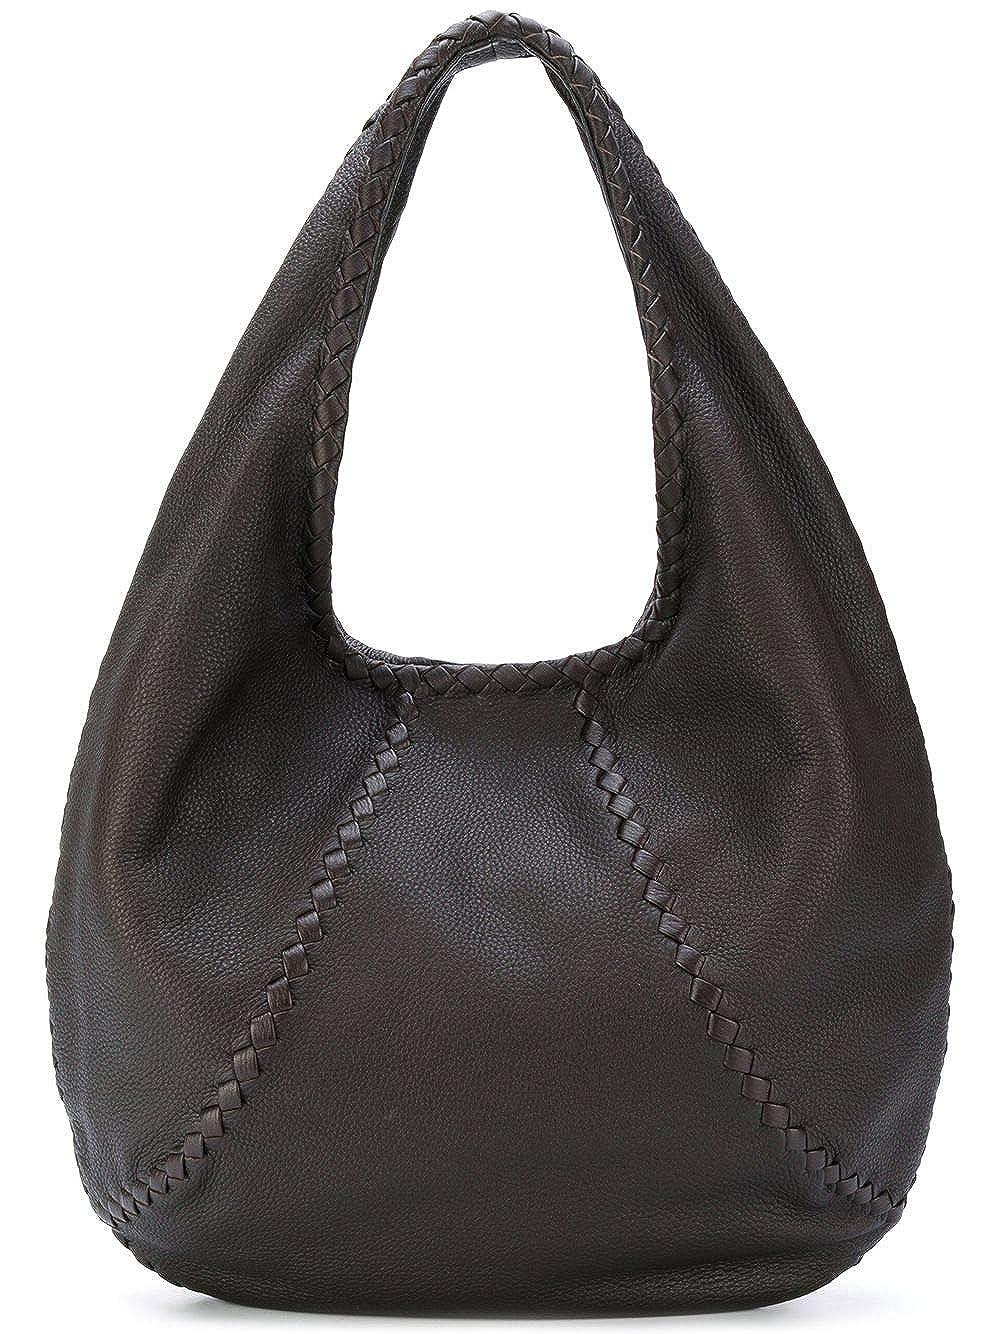 d8fb048469 Amazon.com  Bottega Veneta Cervo Large 212741vq920 Espresso Hobo Bag  Shoes